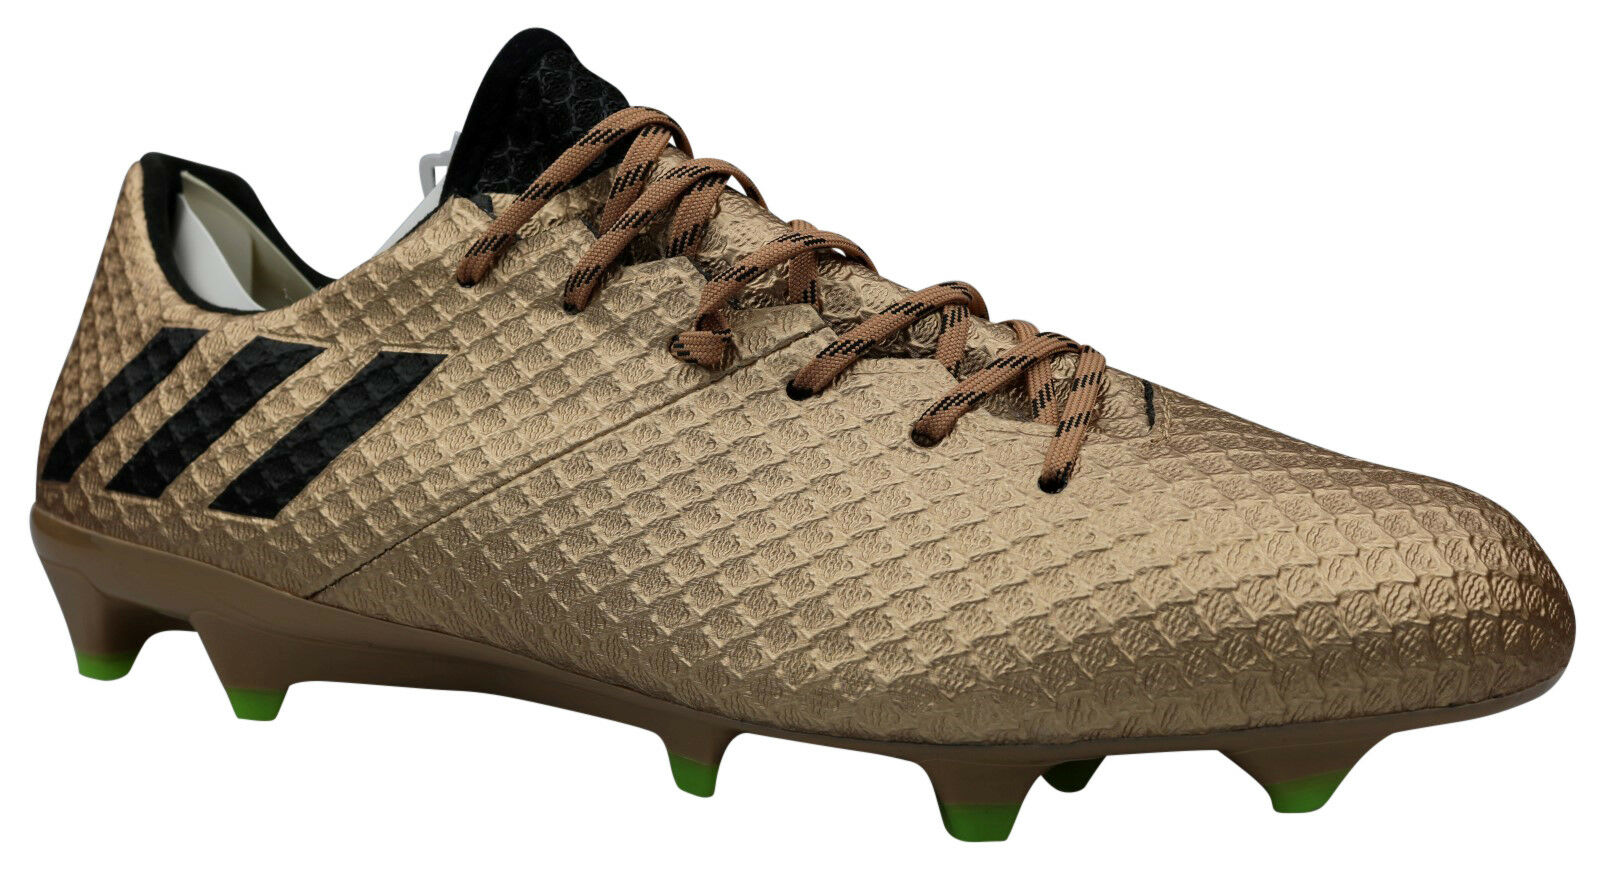 Adidas Messi 16.1 FG FG FG Herren Fußballschuhe BA9109 Nocken Gold Gr 39 - 46 NEU  OVP b4eb8d